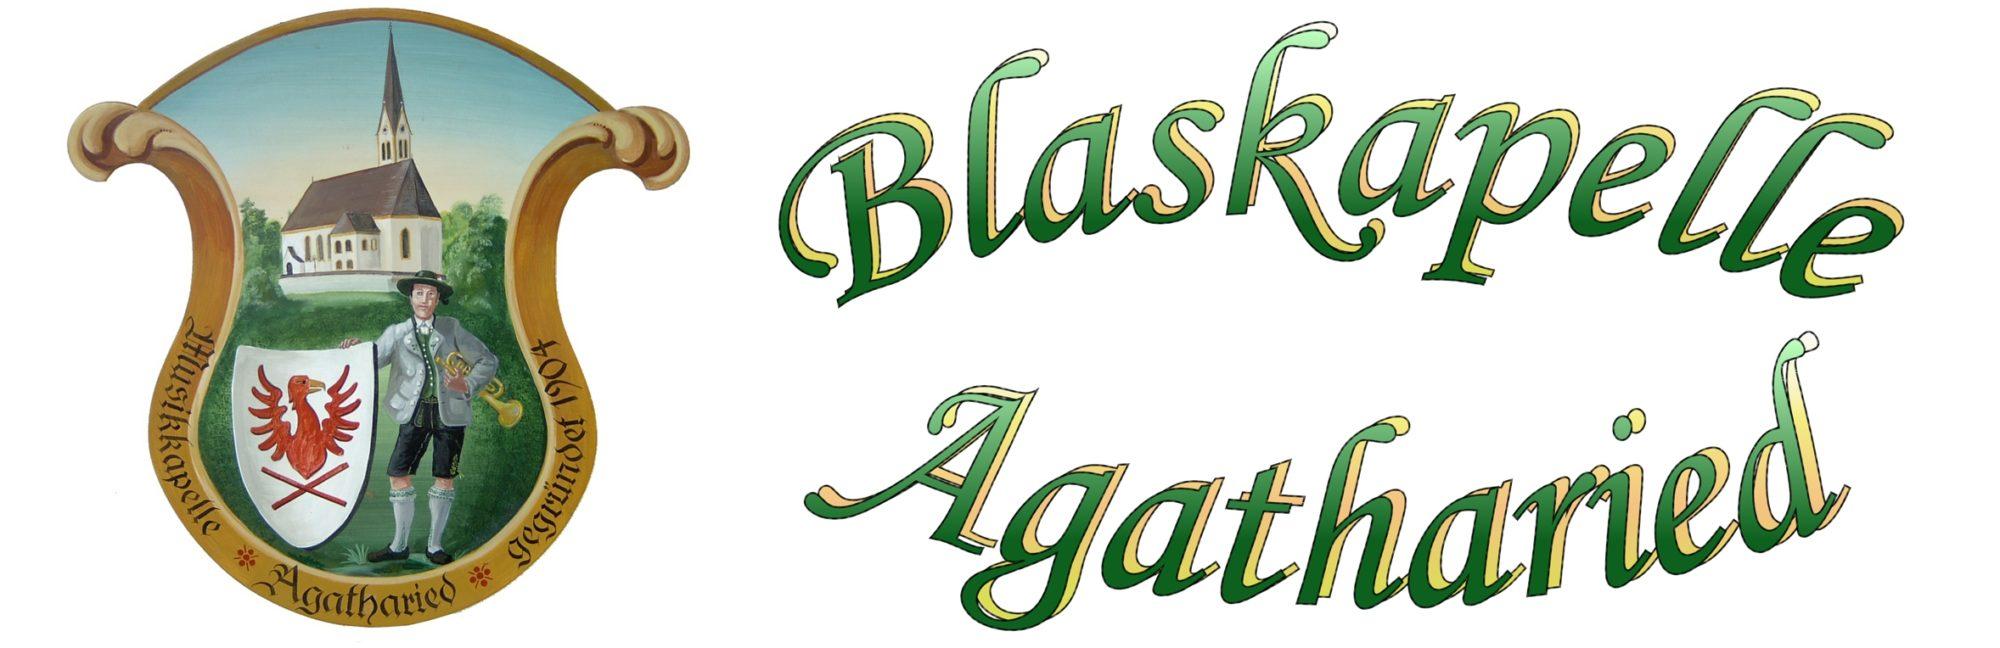 blaskapelle-agatharied.de